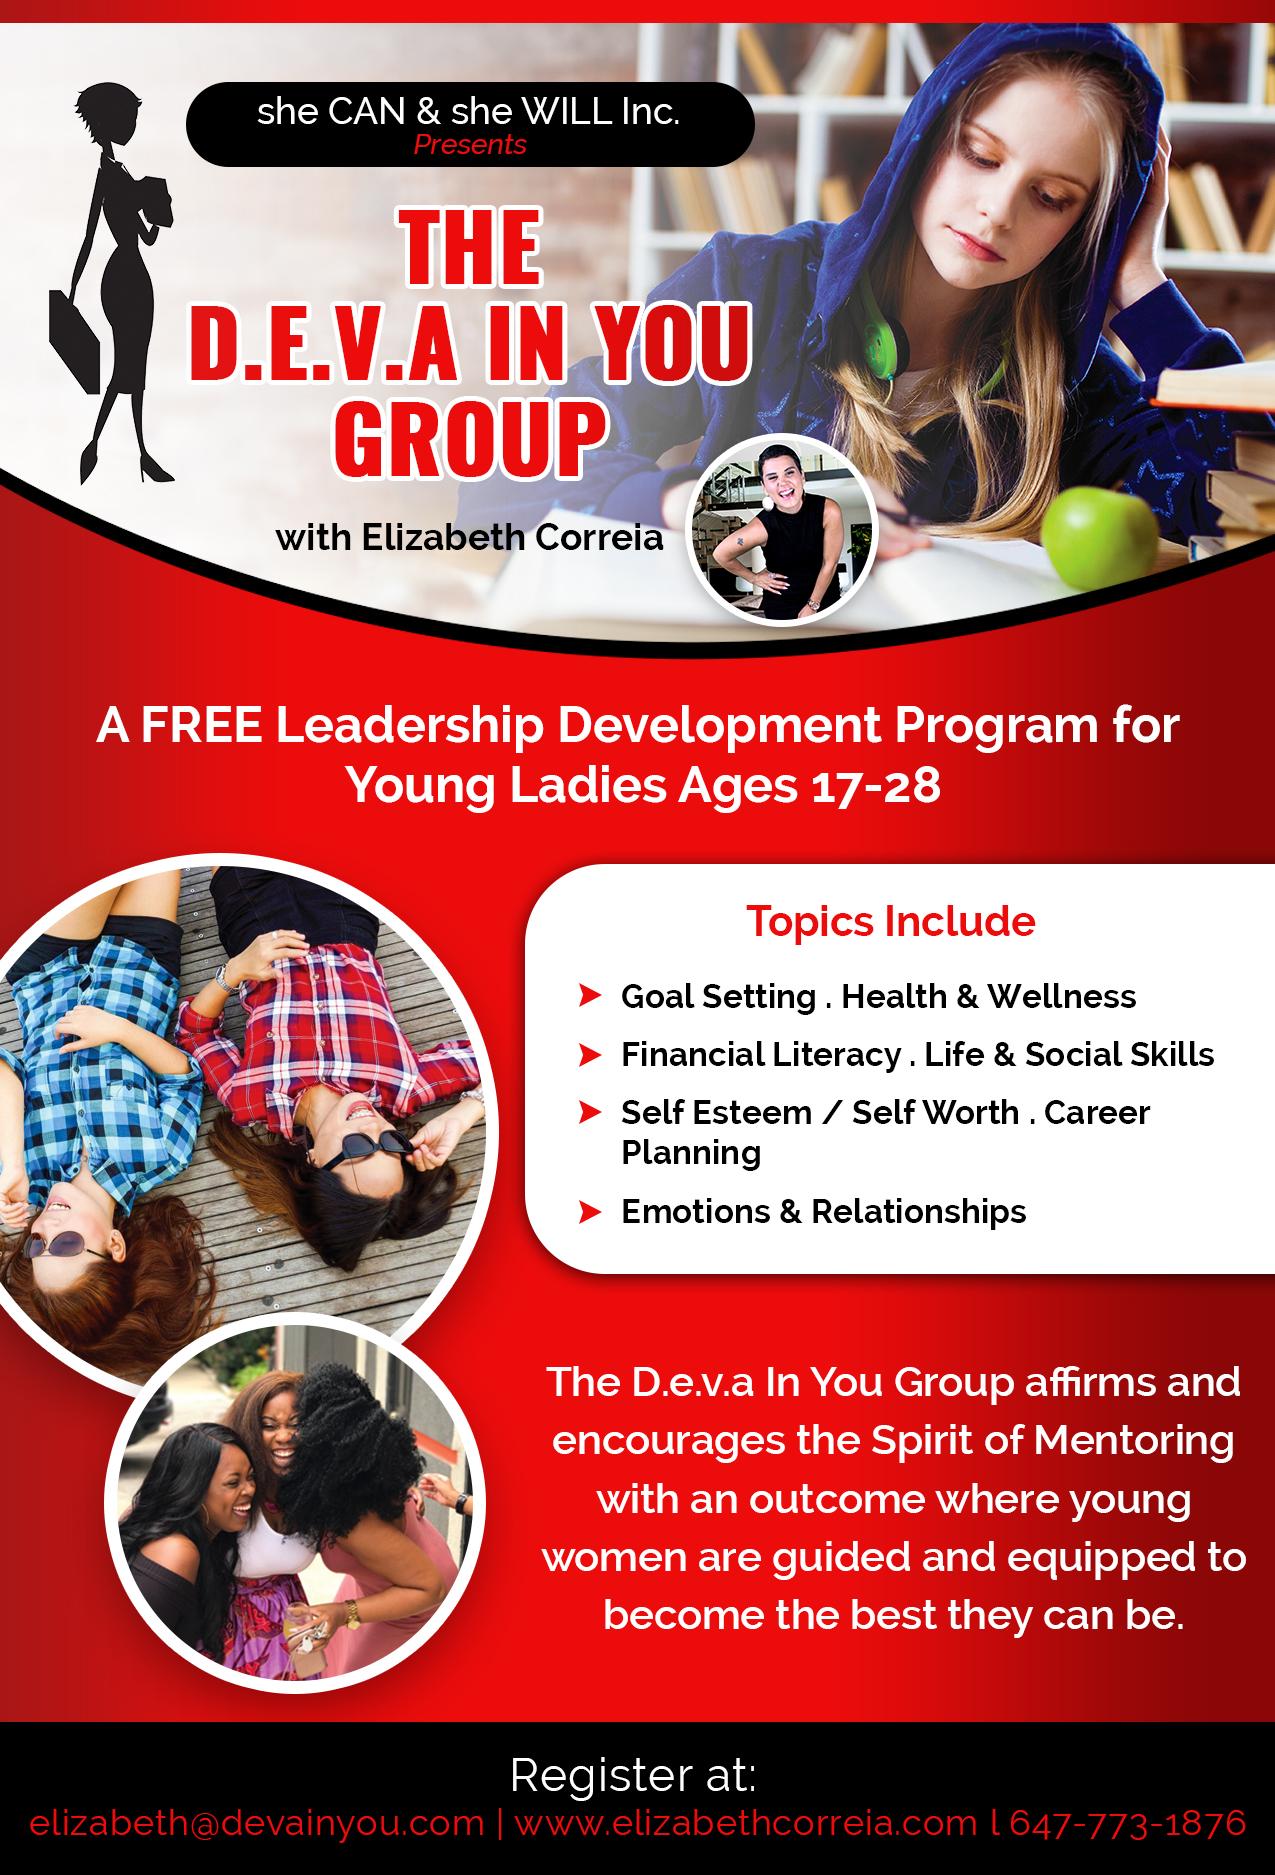 The Deva in You Group - Leadership Development Program